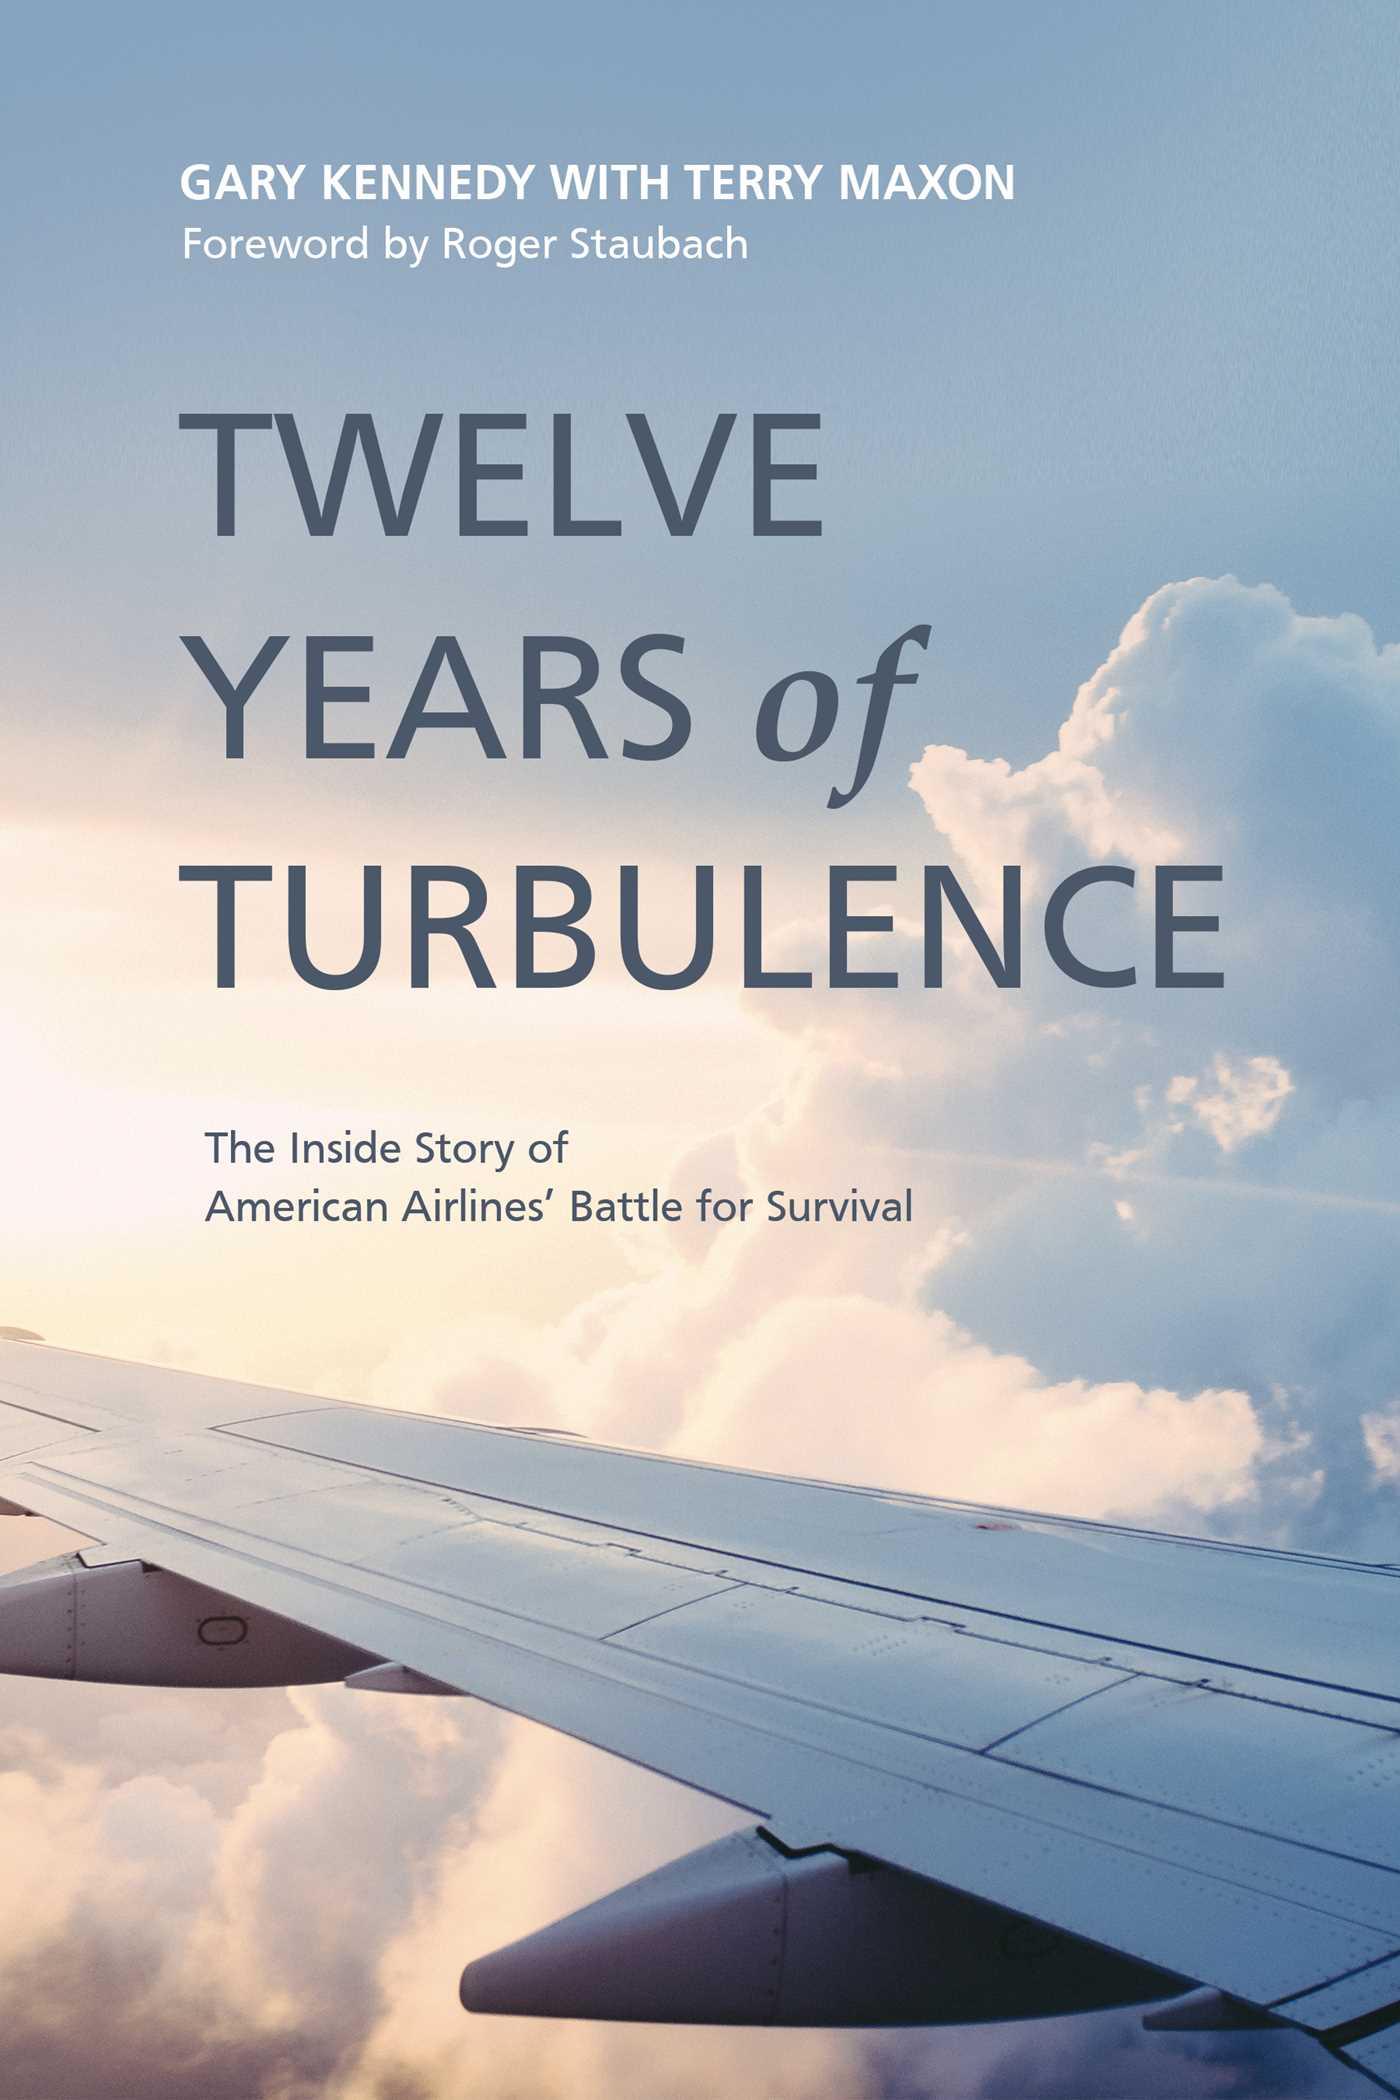 Twelve years of turbulence 9781682614884 hr